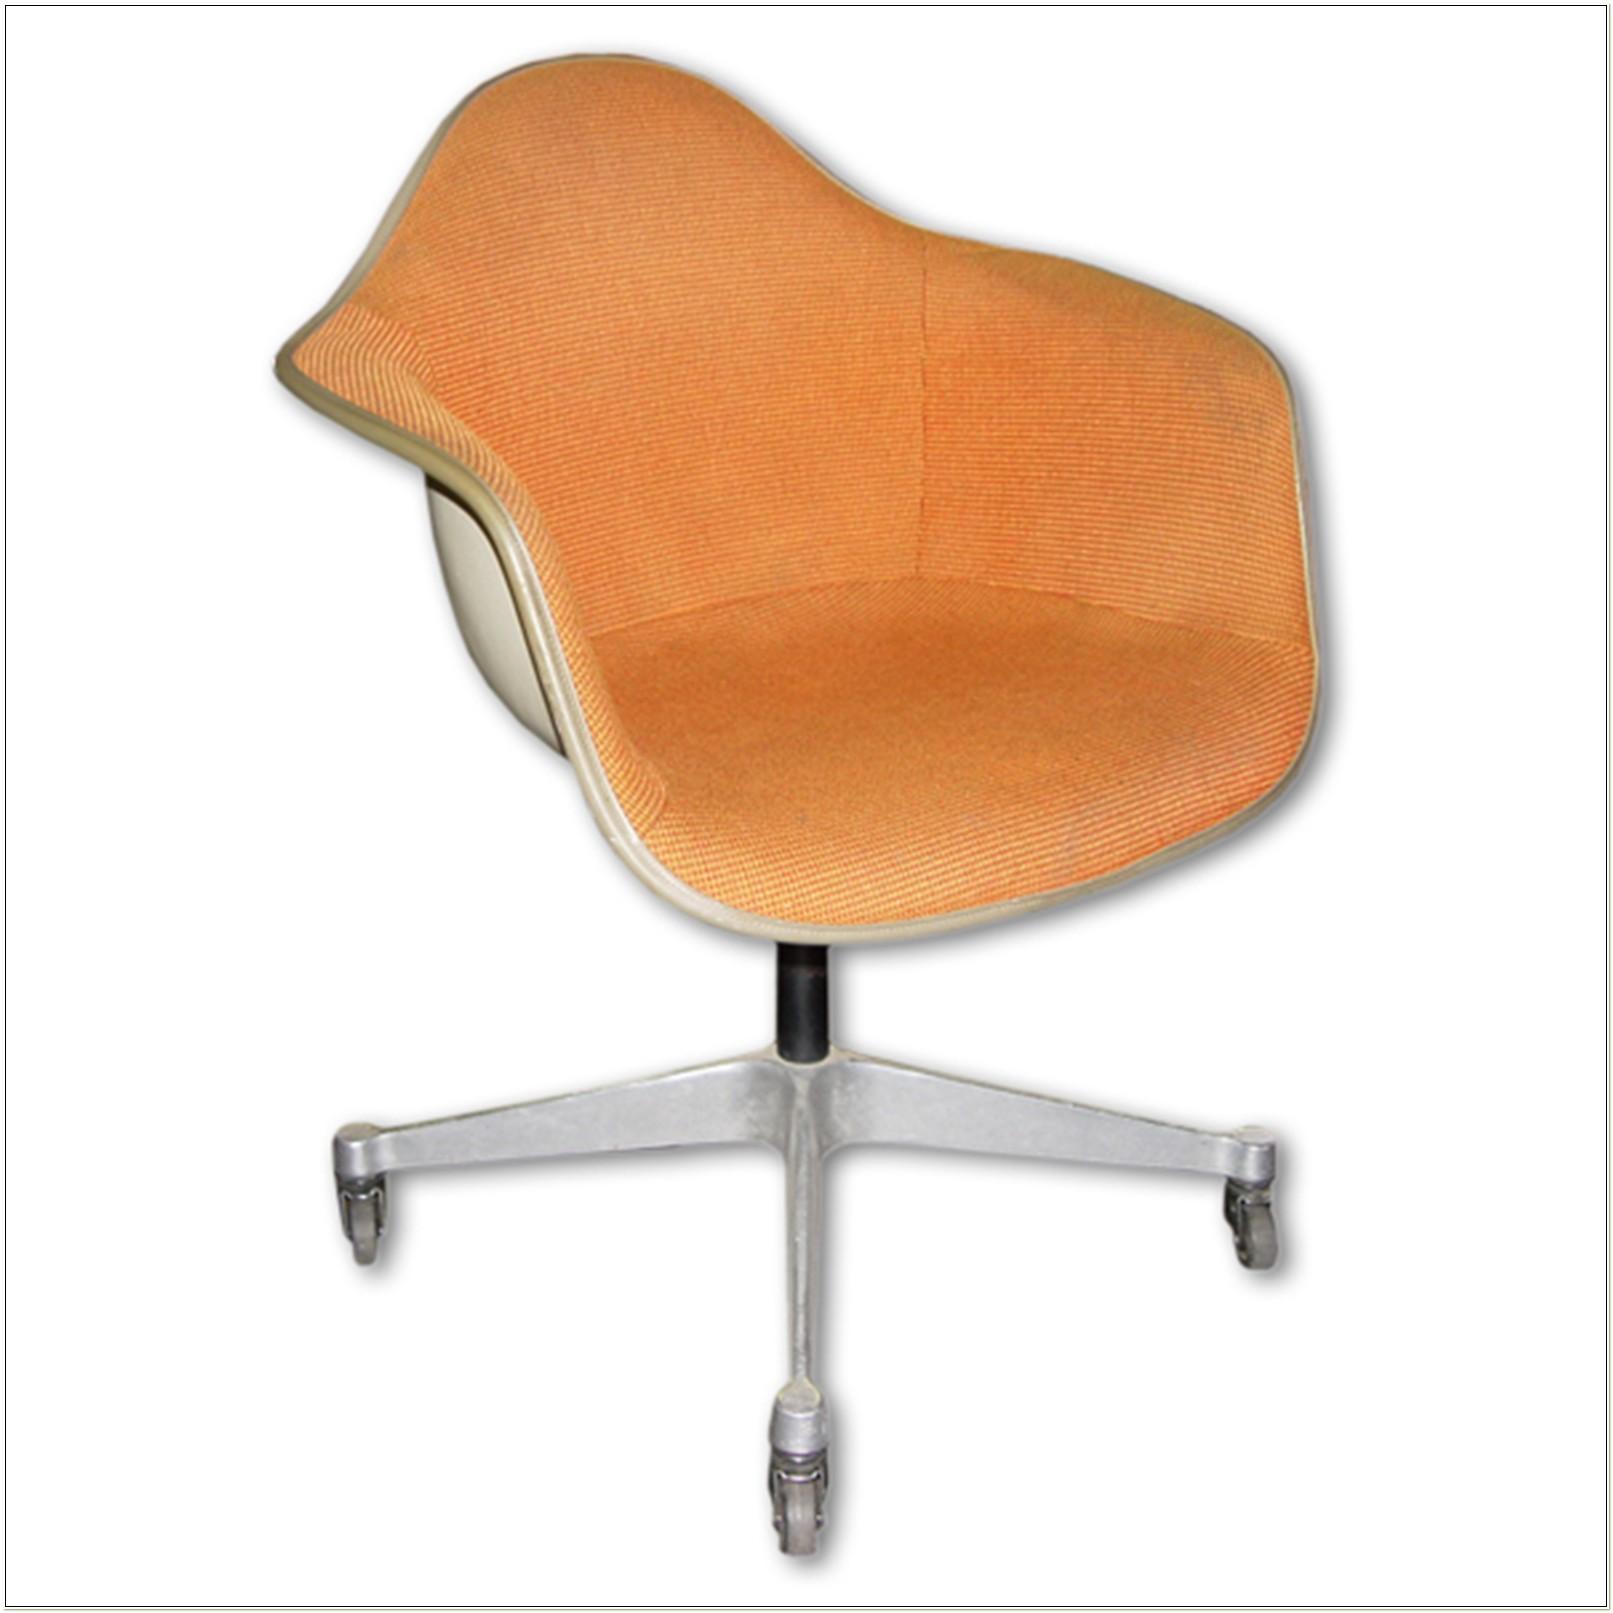 Herman Miller Fiberglass Chairs Ebay